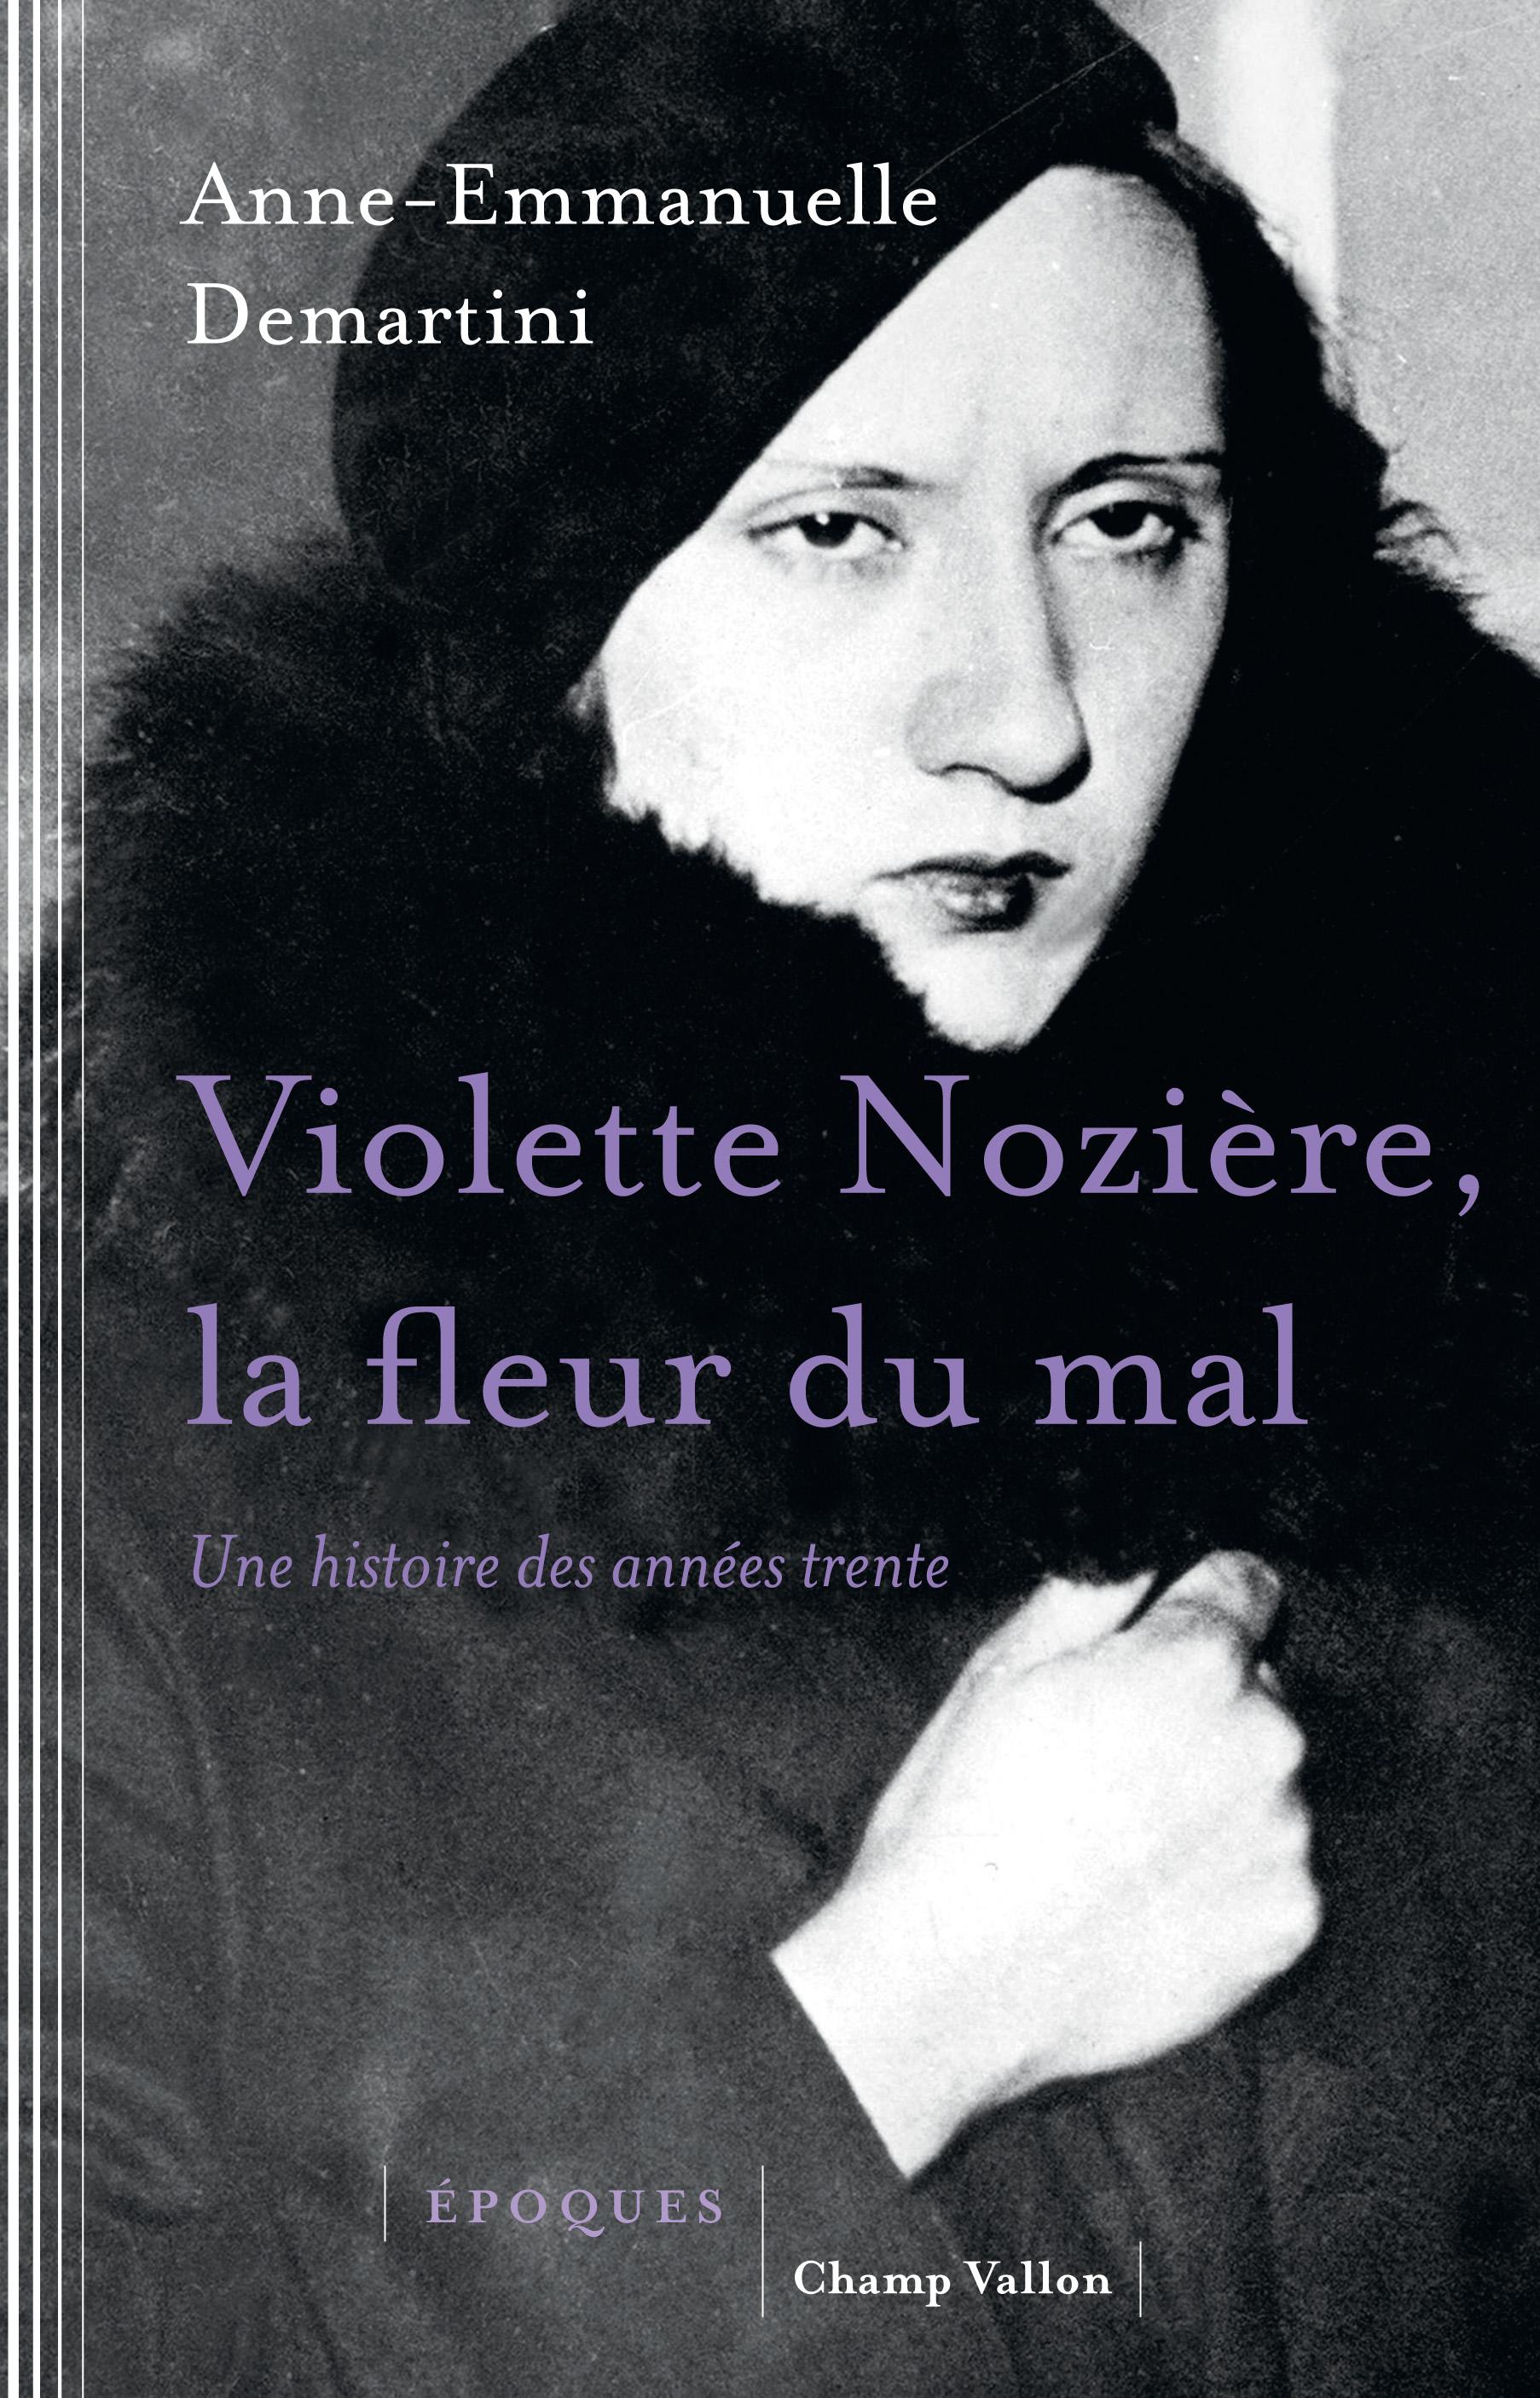 Violette Nozière Demartini